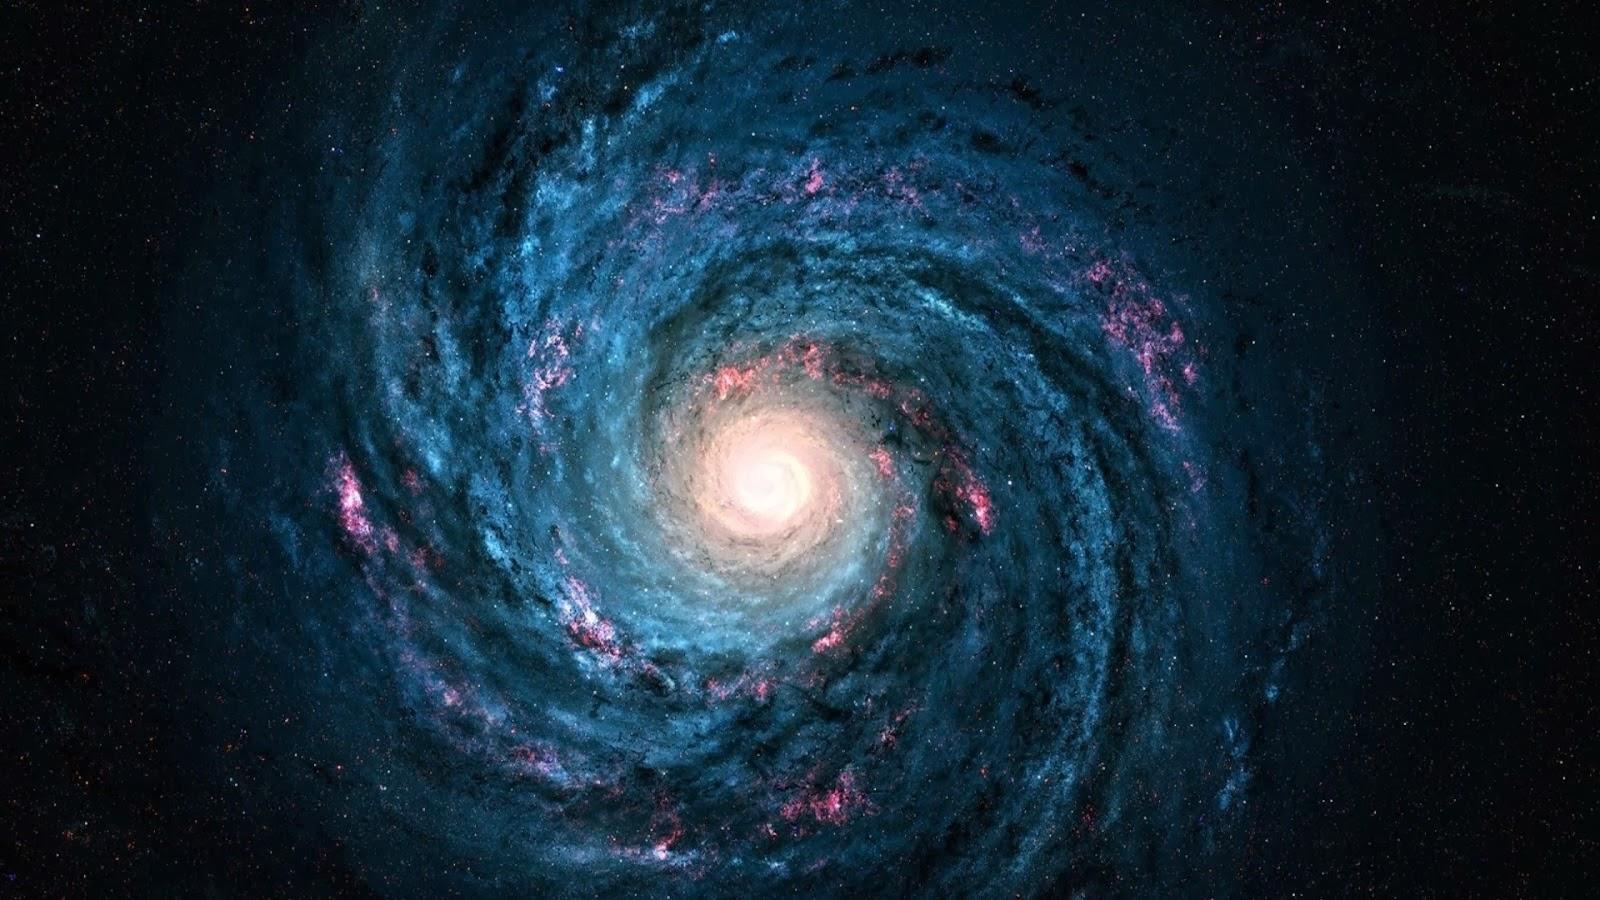 65 Milky Way Hd Wallpaper On Wallpapersafari